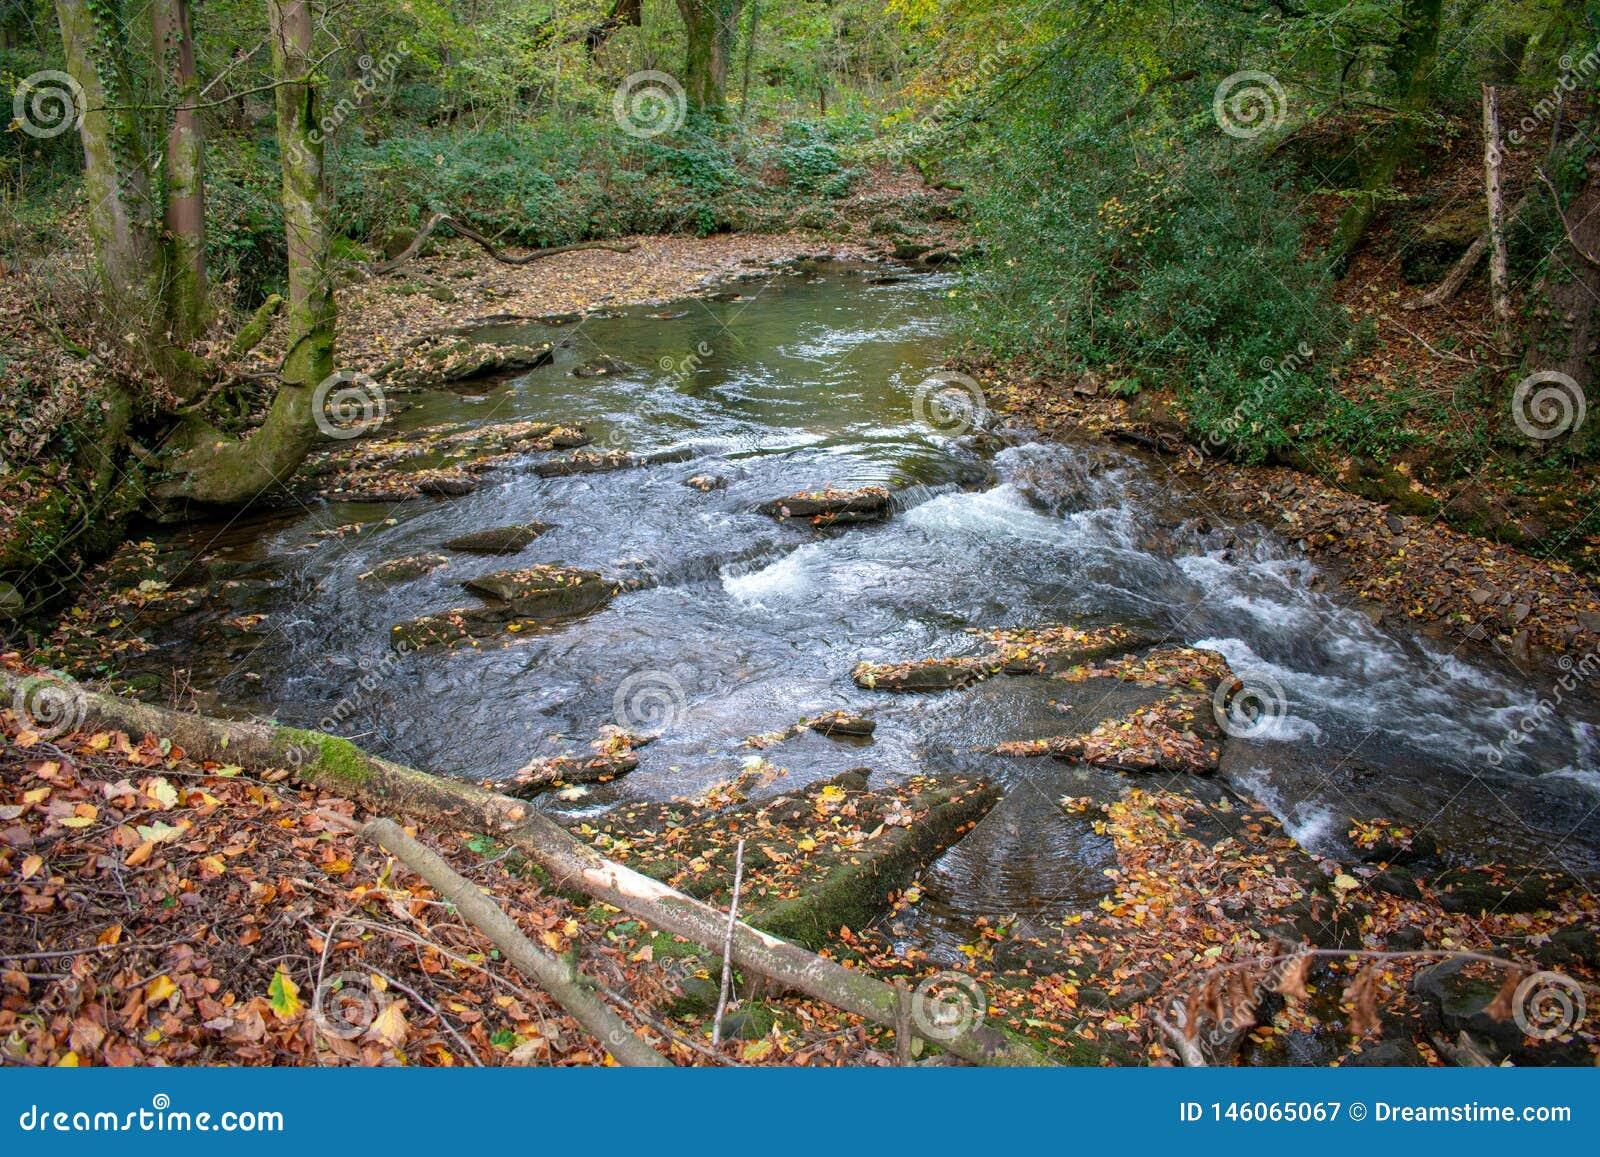 Поток бежать через лес валийца